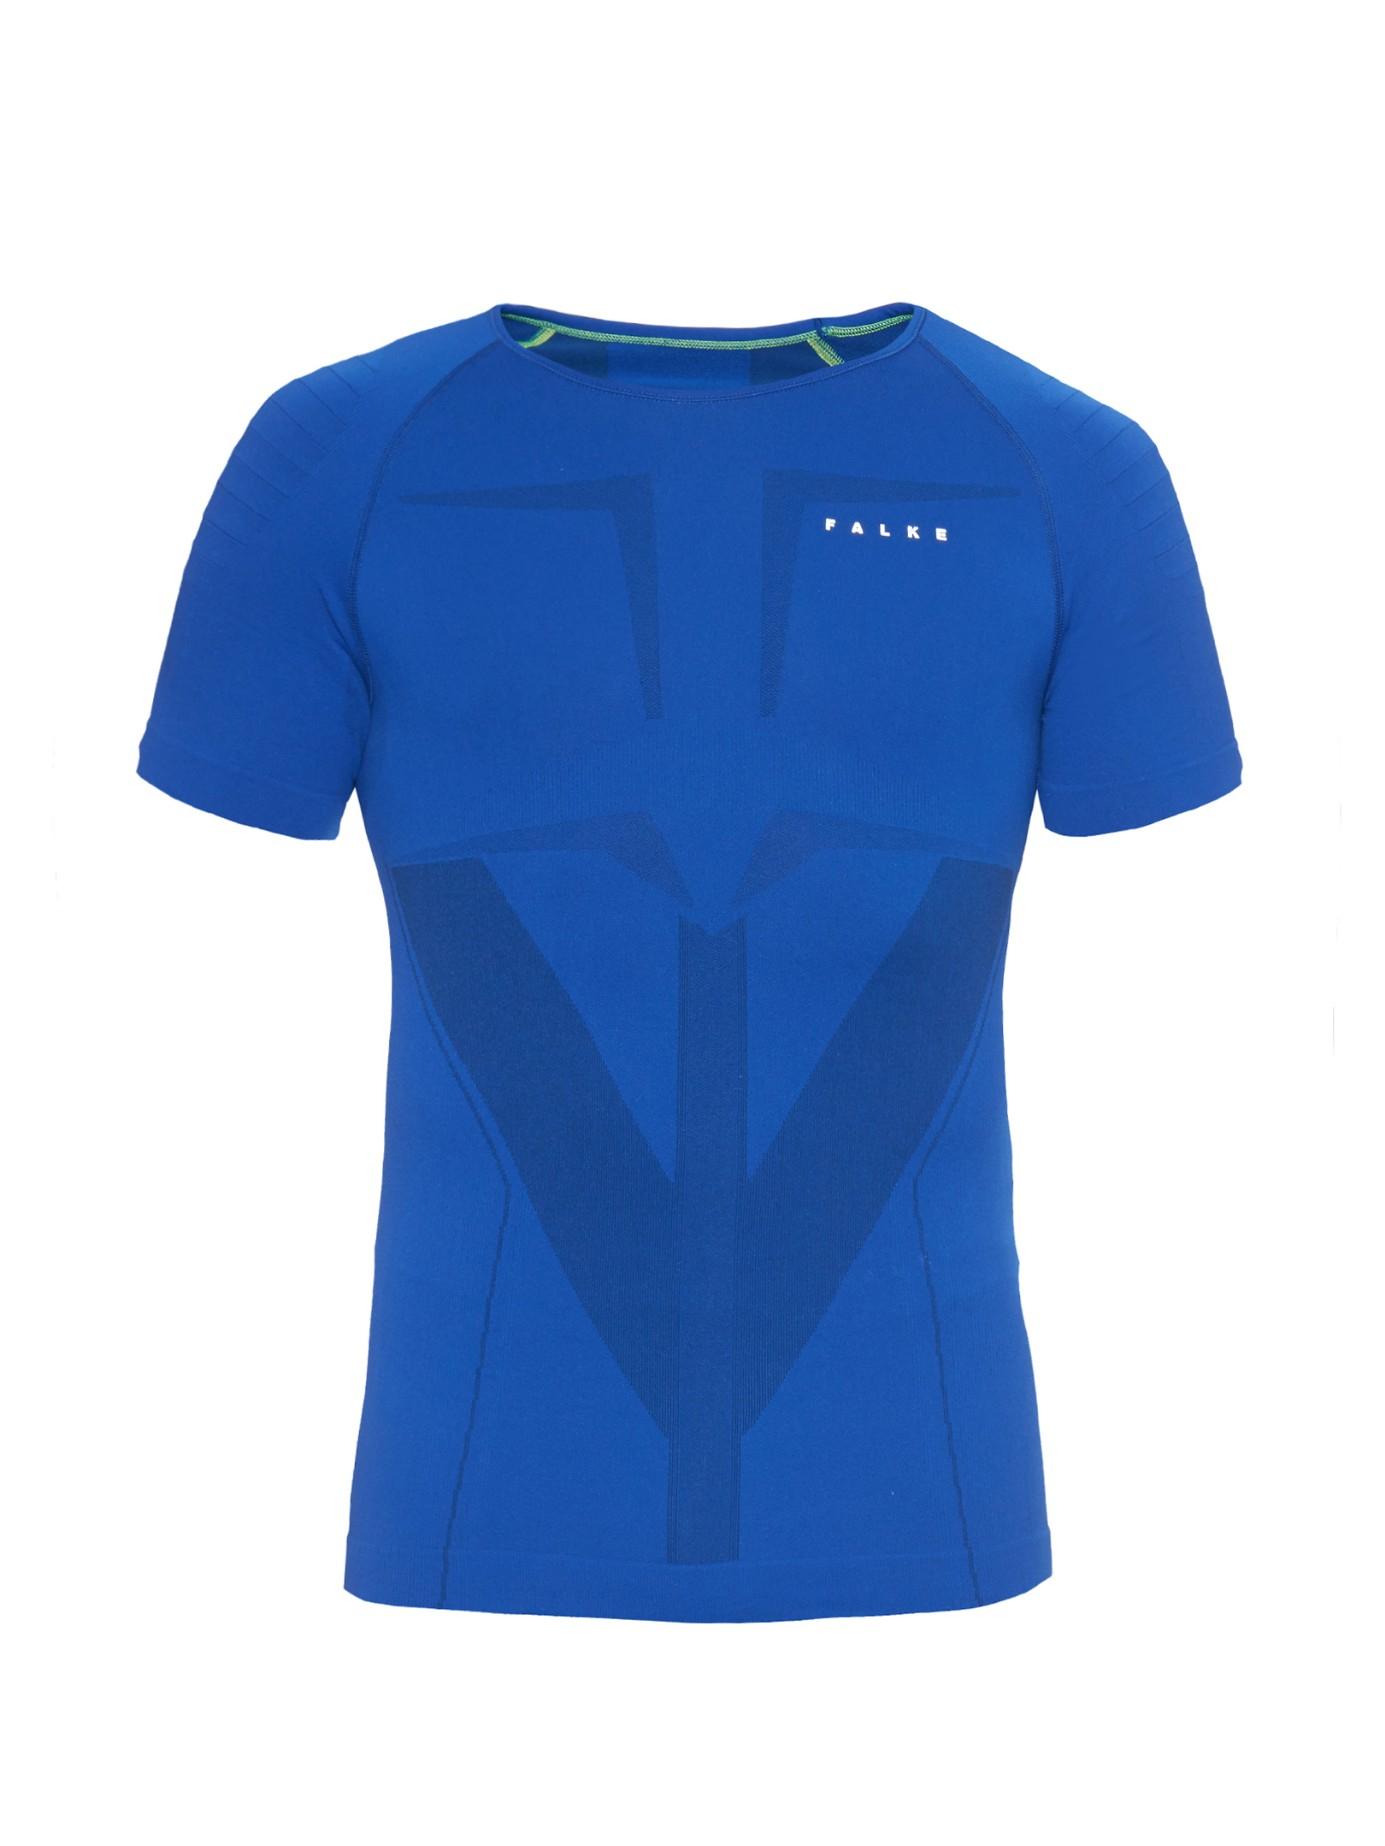 Falke base layer t shirt in blue for men lyst for Womens base layer shirt